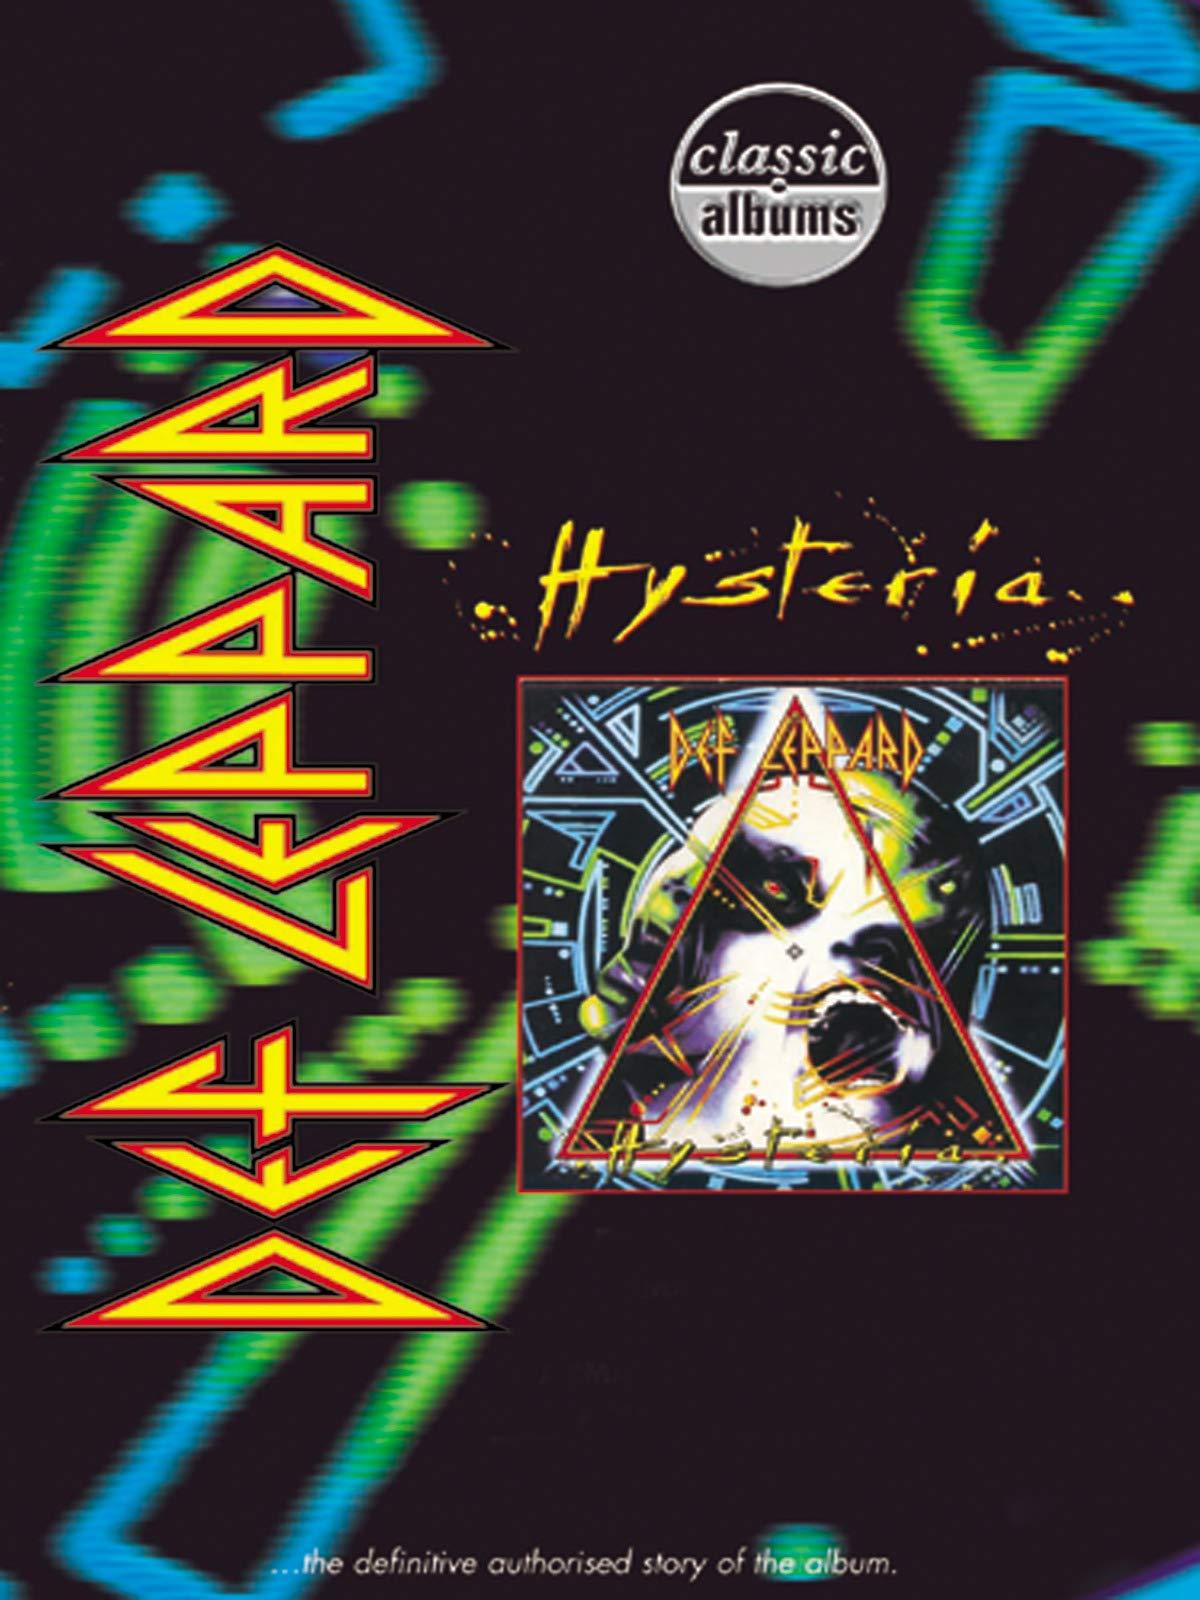 Def Leppard - Hysteria (Classic Album) on Amazon Prime Instant Video UK